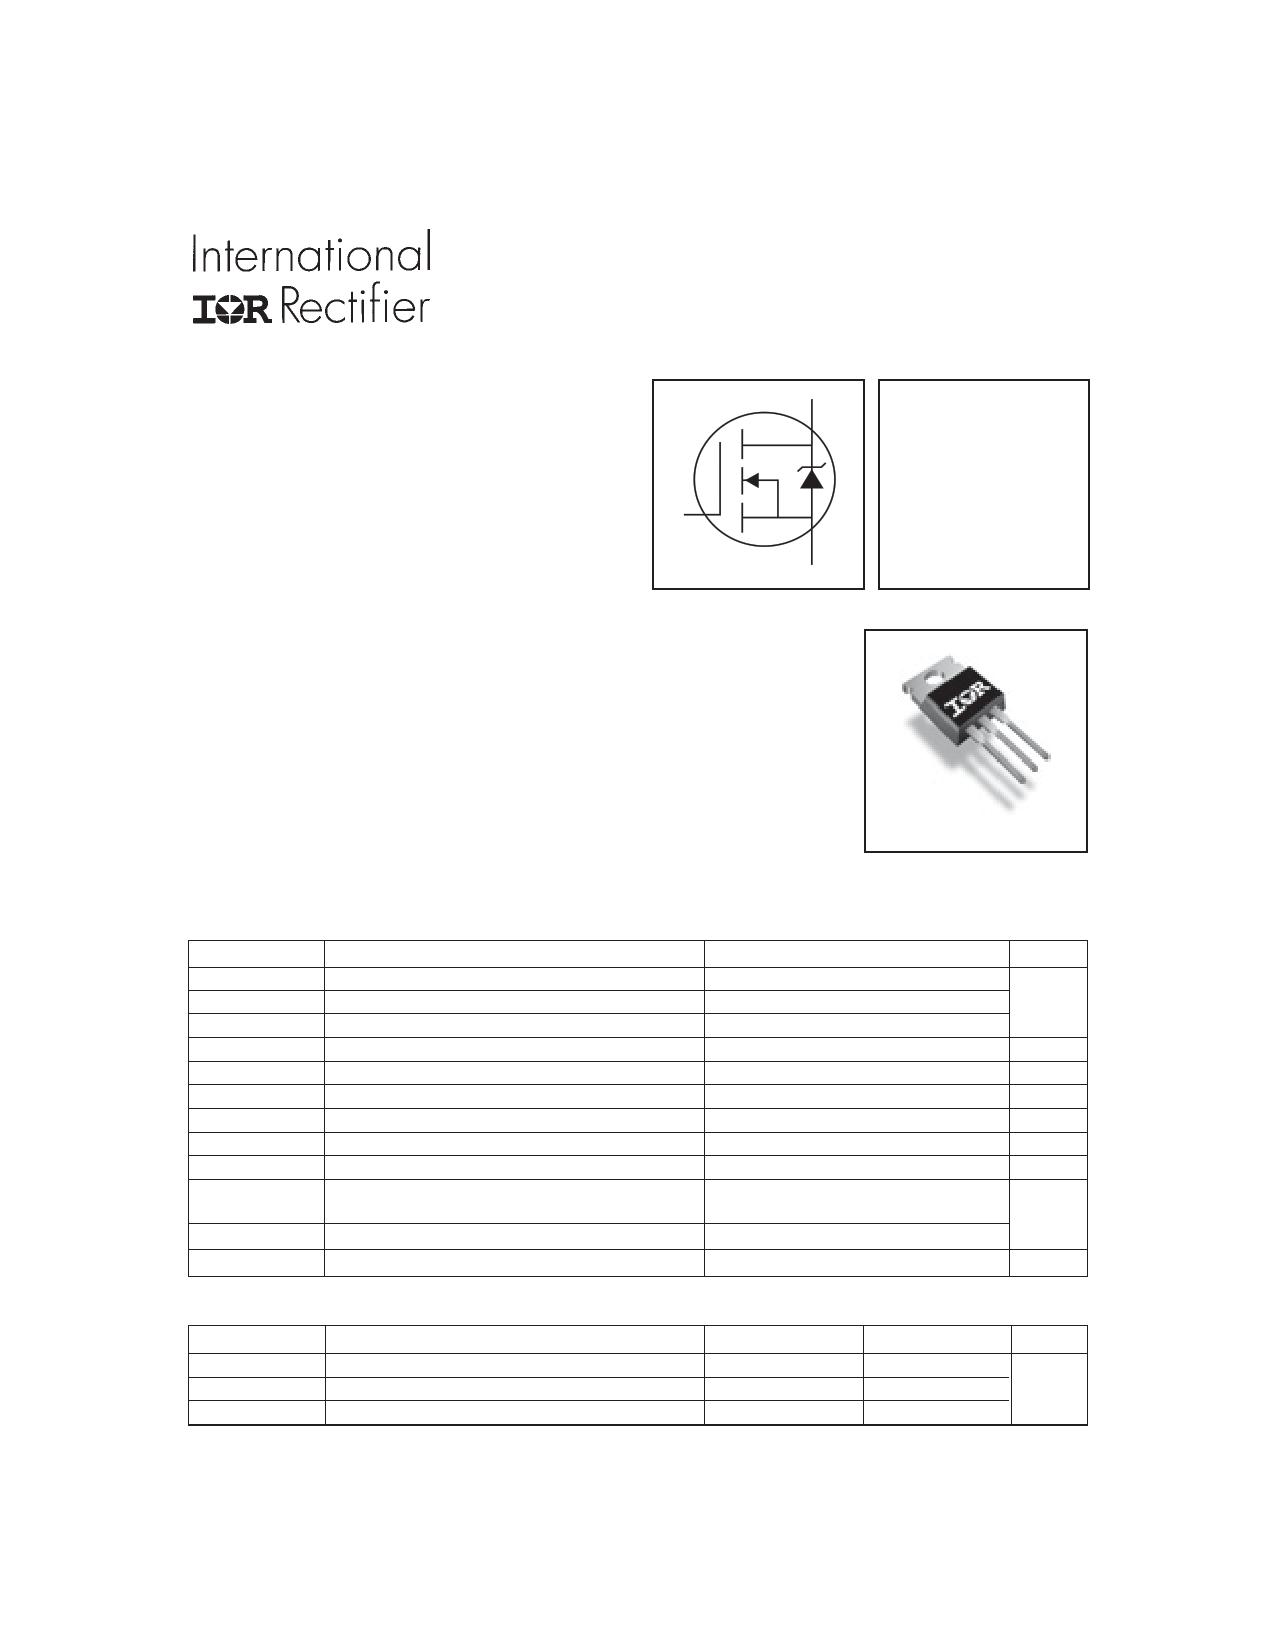 IRFB4215PbF Datasheet, IRFB4215PbF PDF,ピン配置, 機能